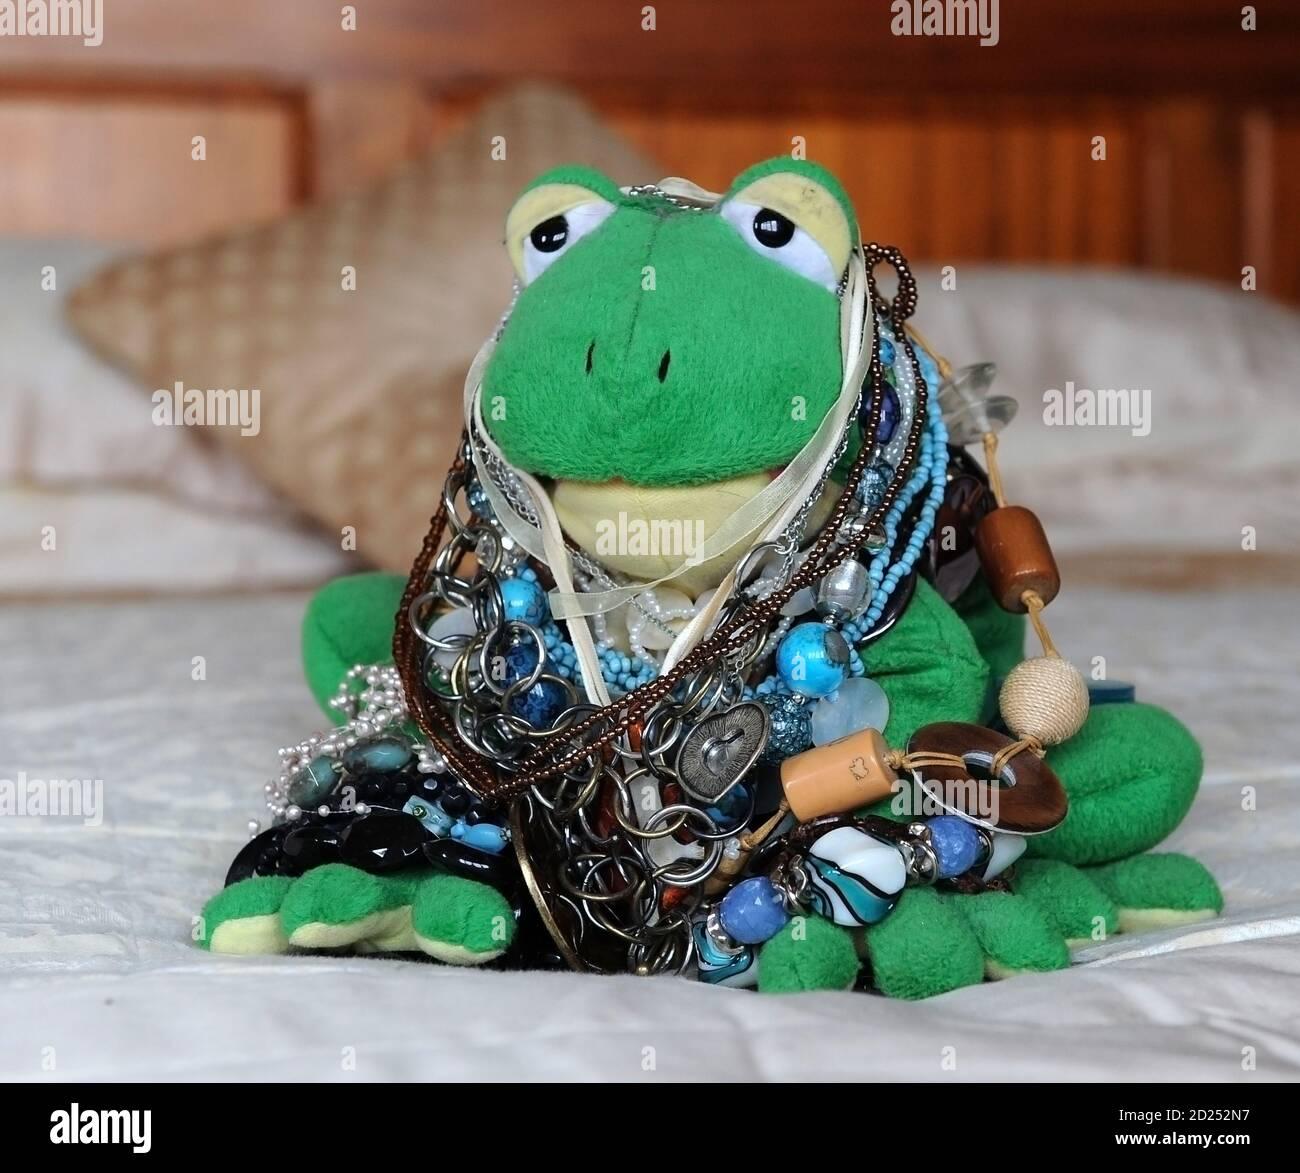 Sapo De Navidad Fotos e Imágenes de stock - Alamy